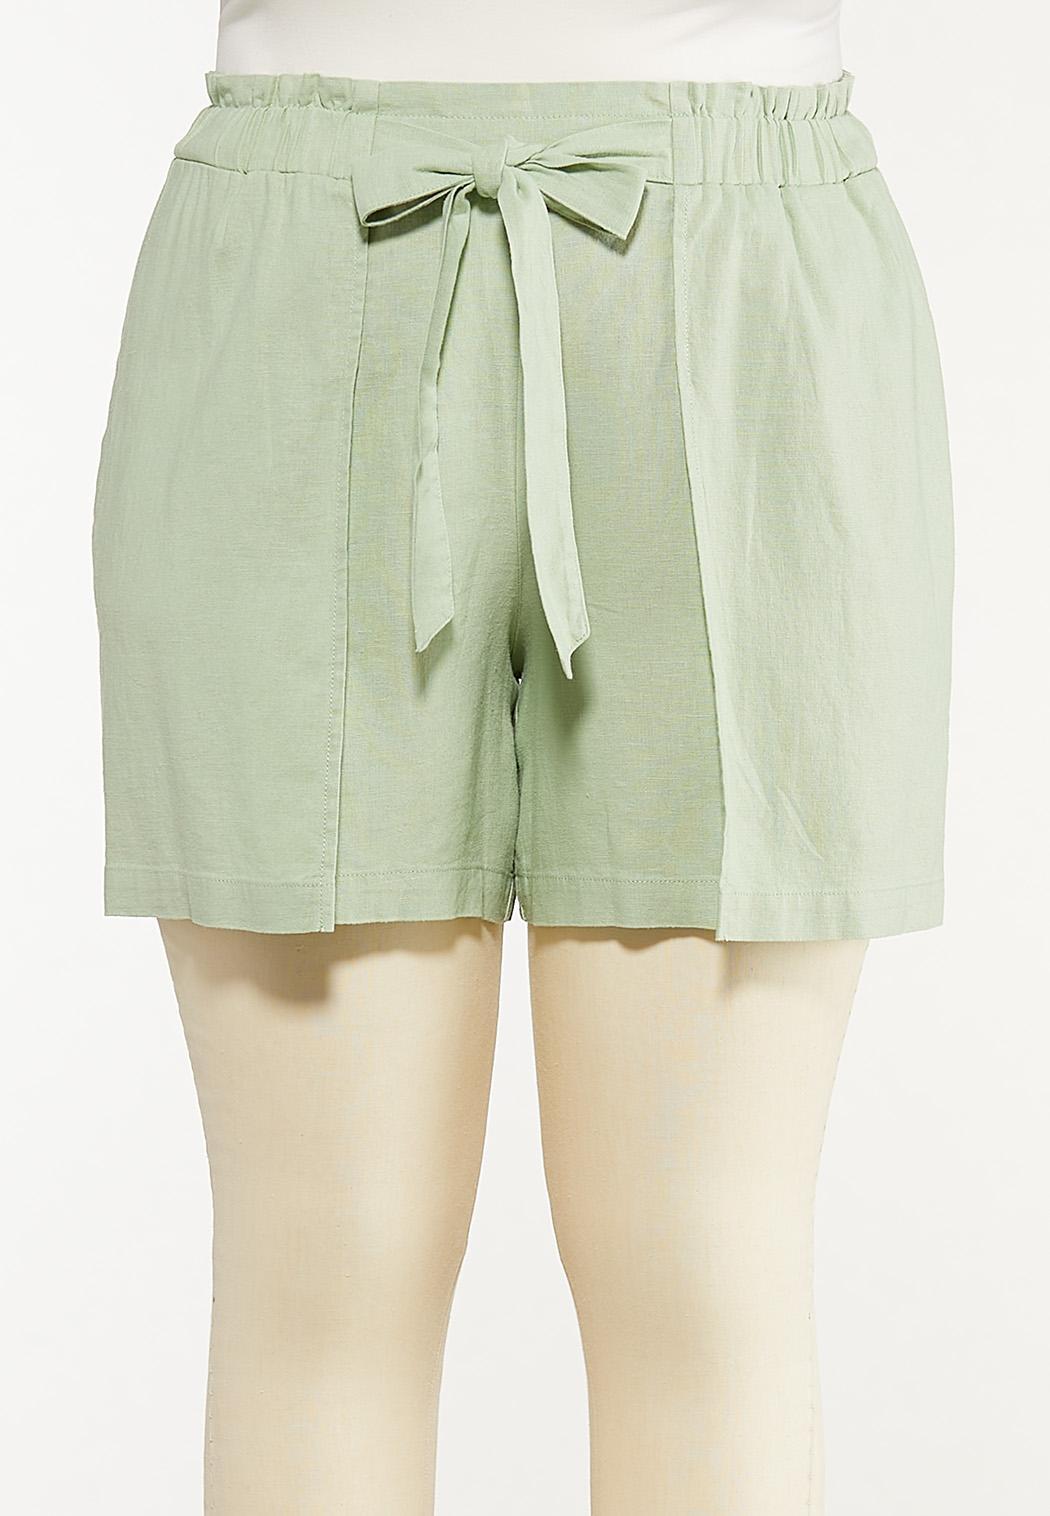 Plus Size Green Linen Shorts